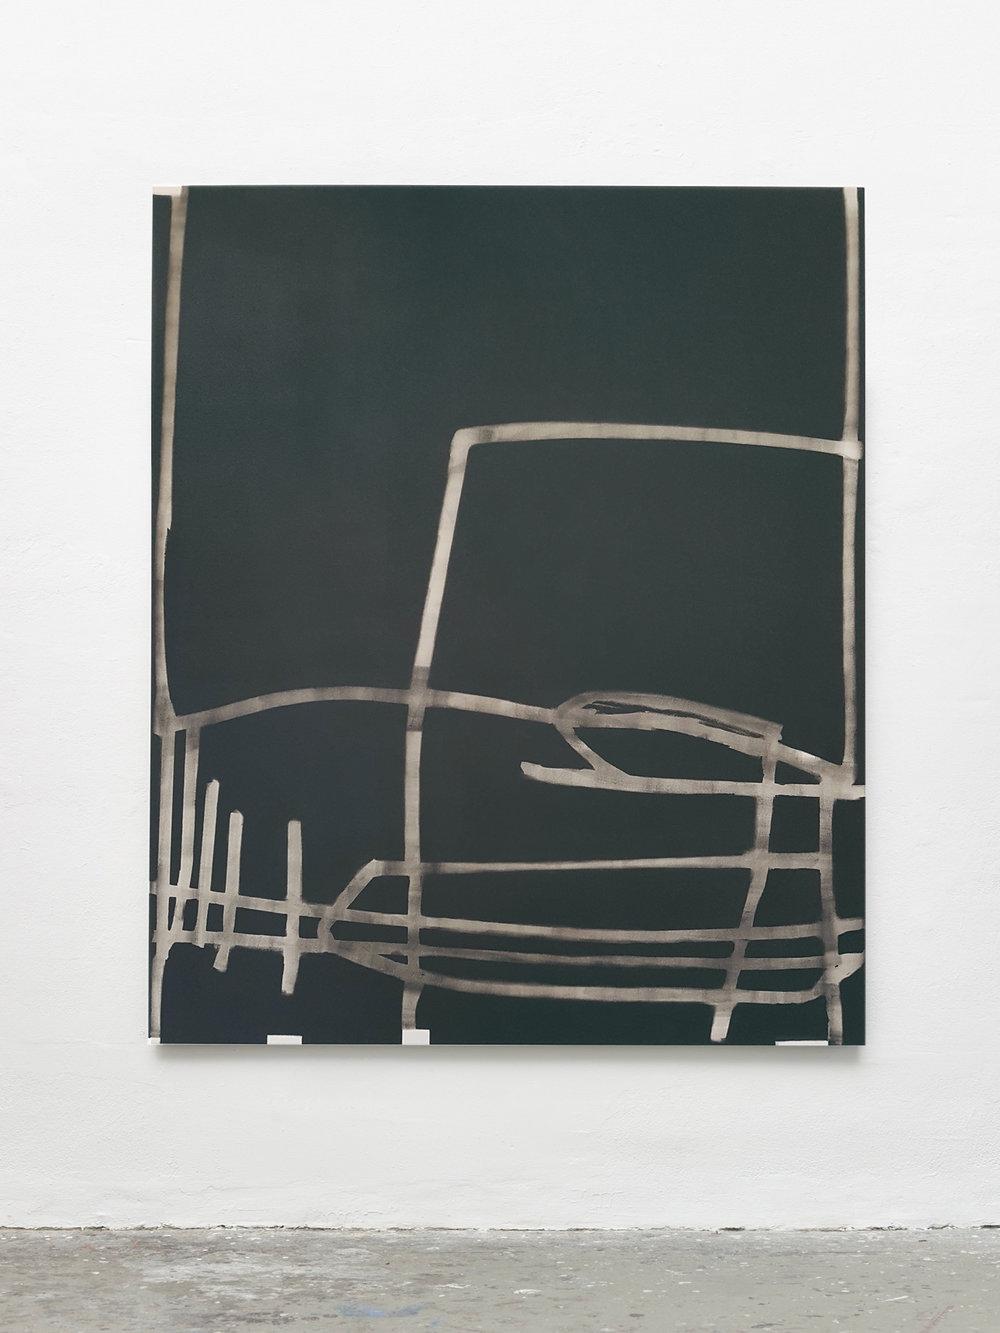 Laura Sachs, Dusty R., 180 x 150 cm; Oil on Canvas, 2017